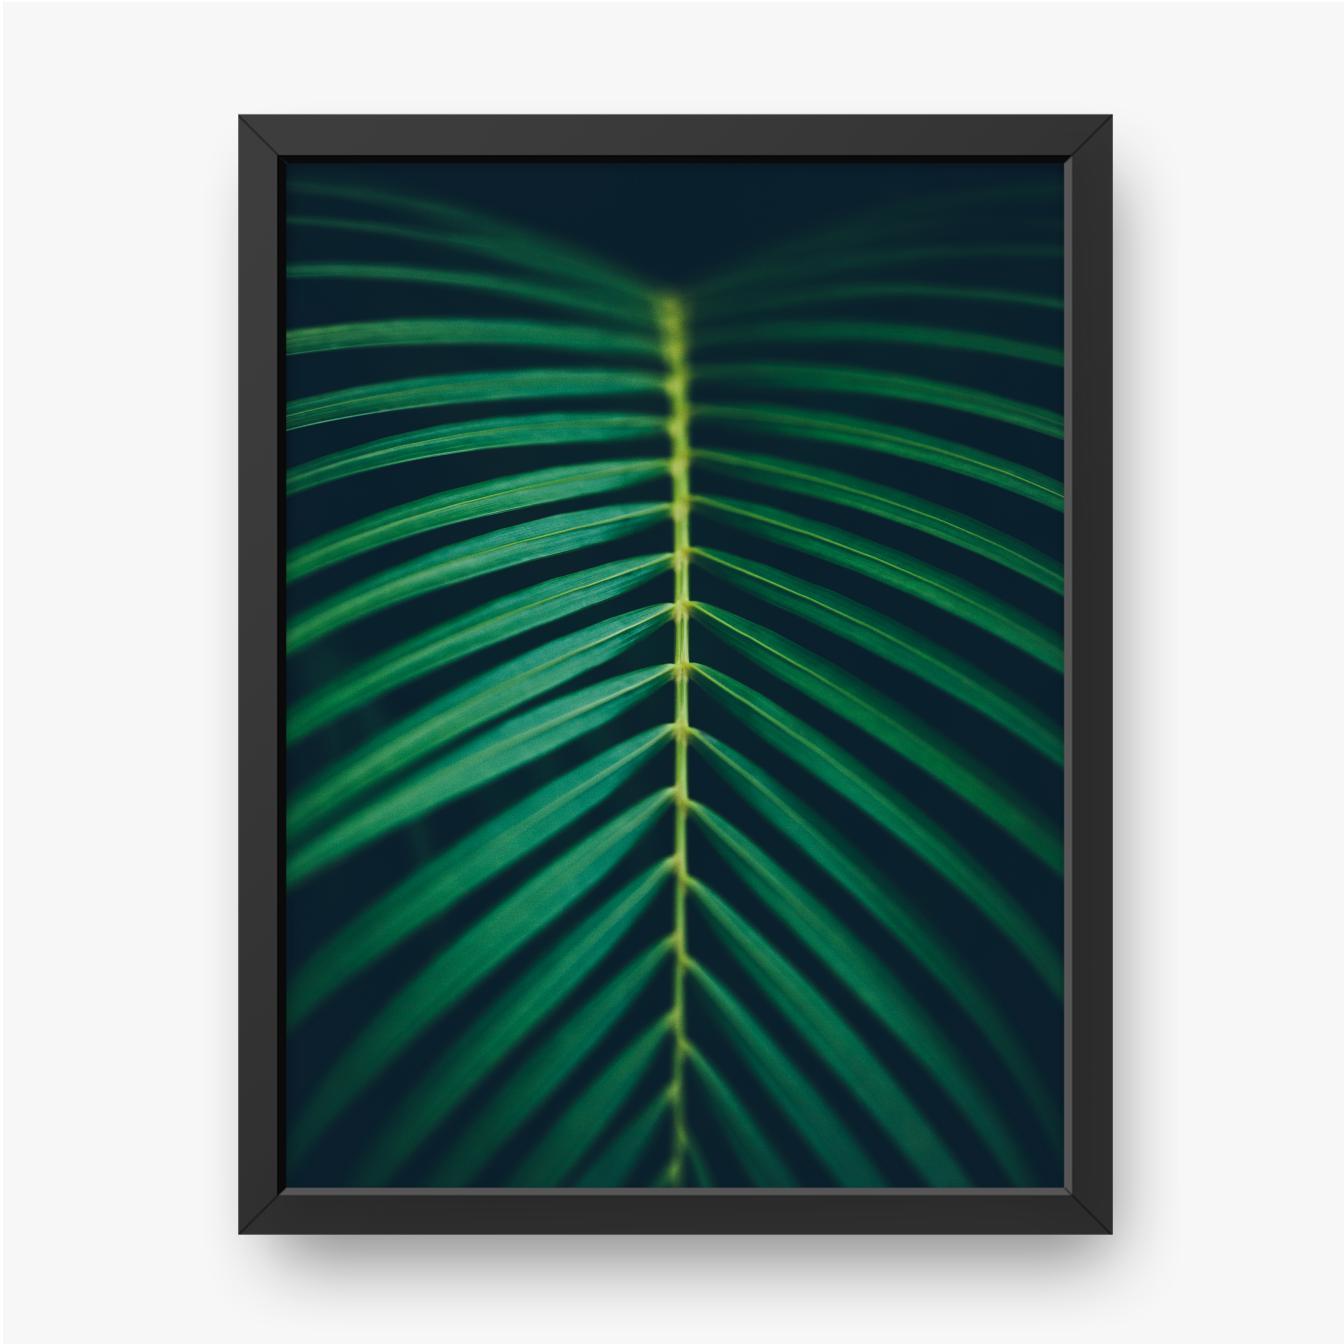 Palmblatt aus der Nähe